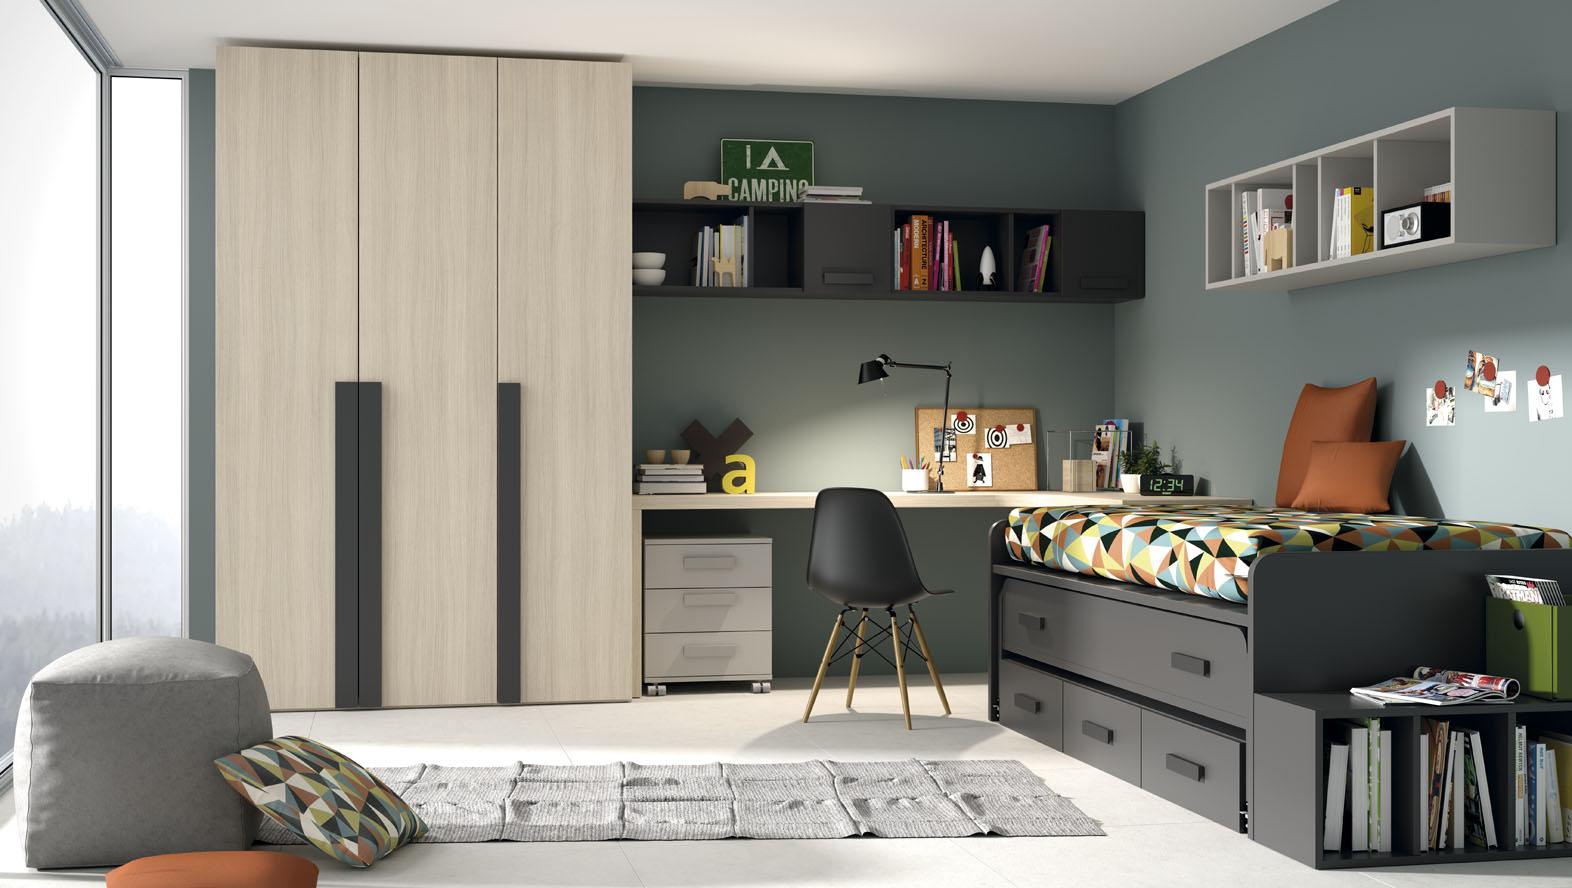 Dormitorios Juveniles ~ Dormitorios Infantiles A Medida